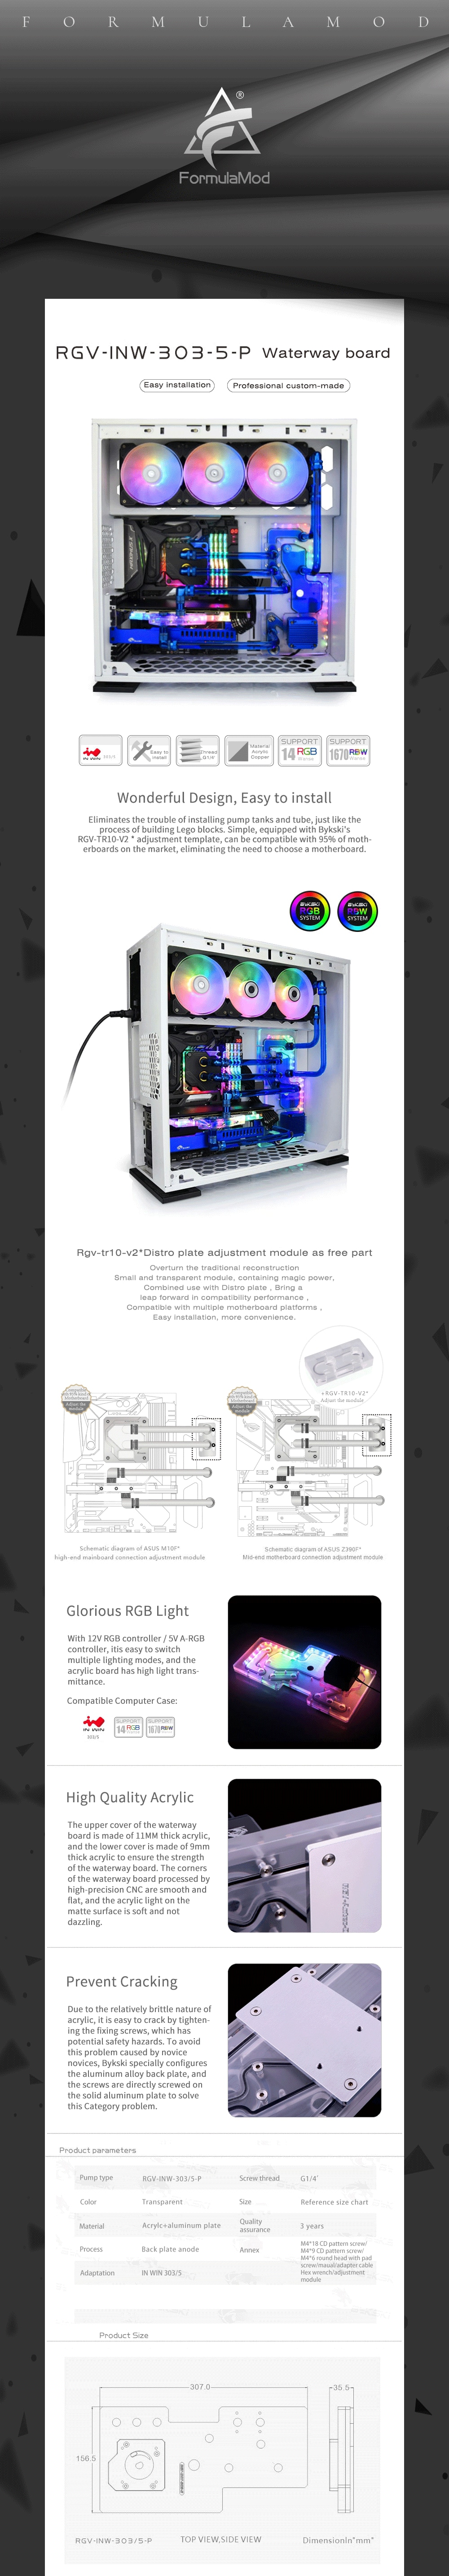 Bykski Waterway Cooling Kit For IN WIN 303/5 Case, 5V ARGB, For Single GPU Building, RGV-INW-303/5-P